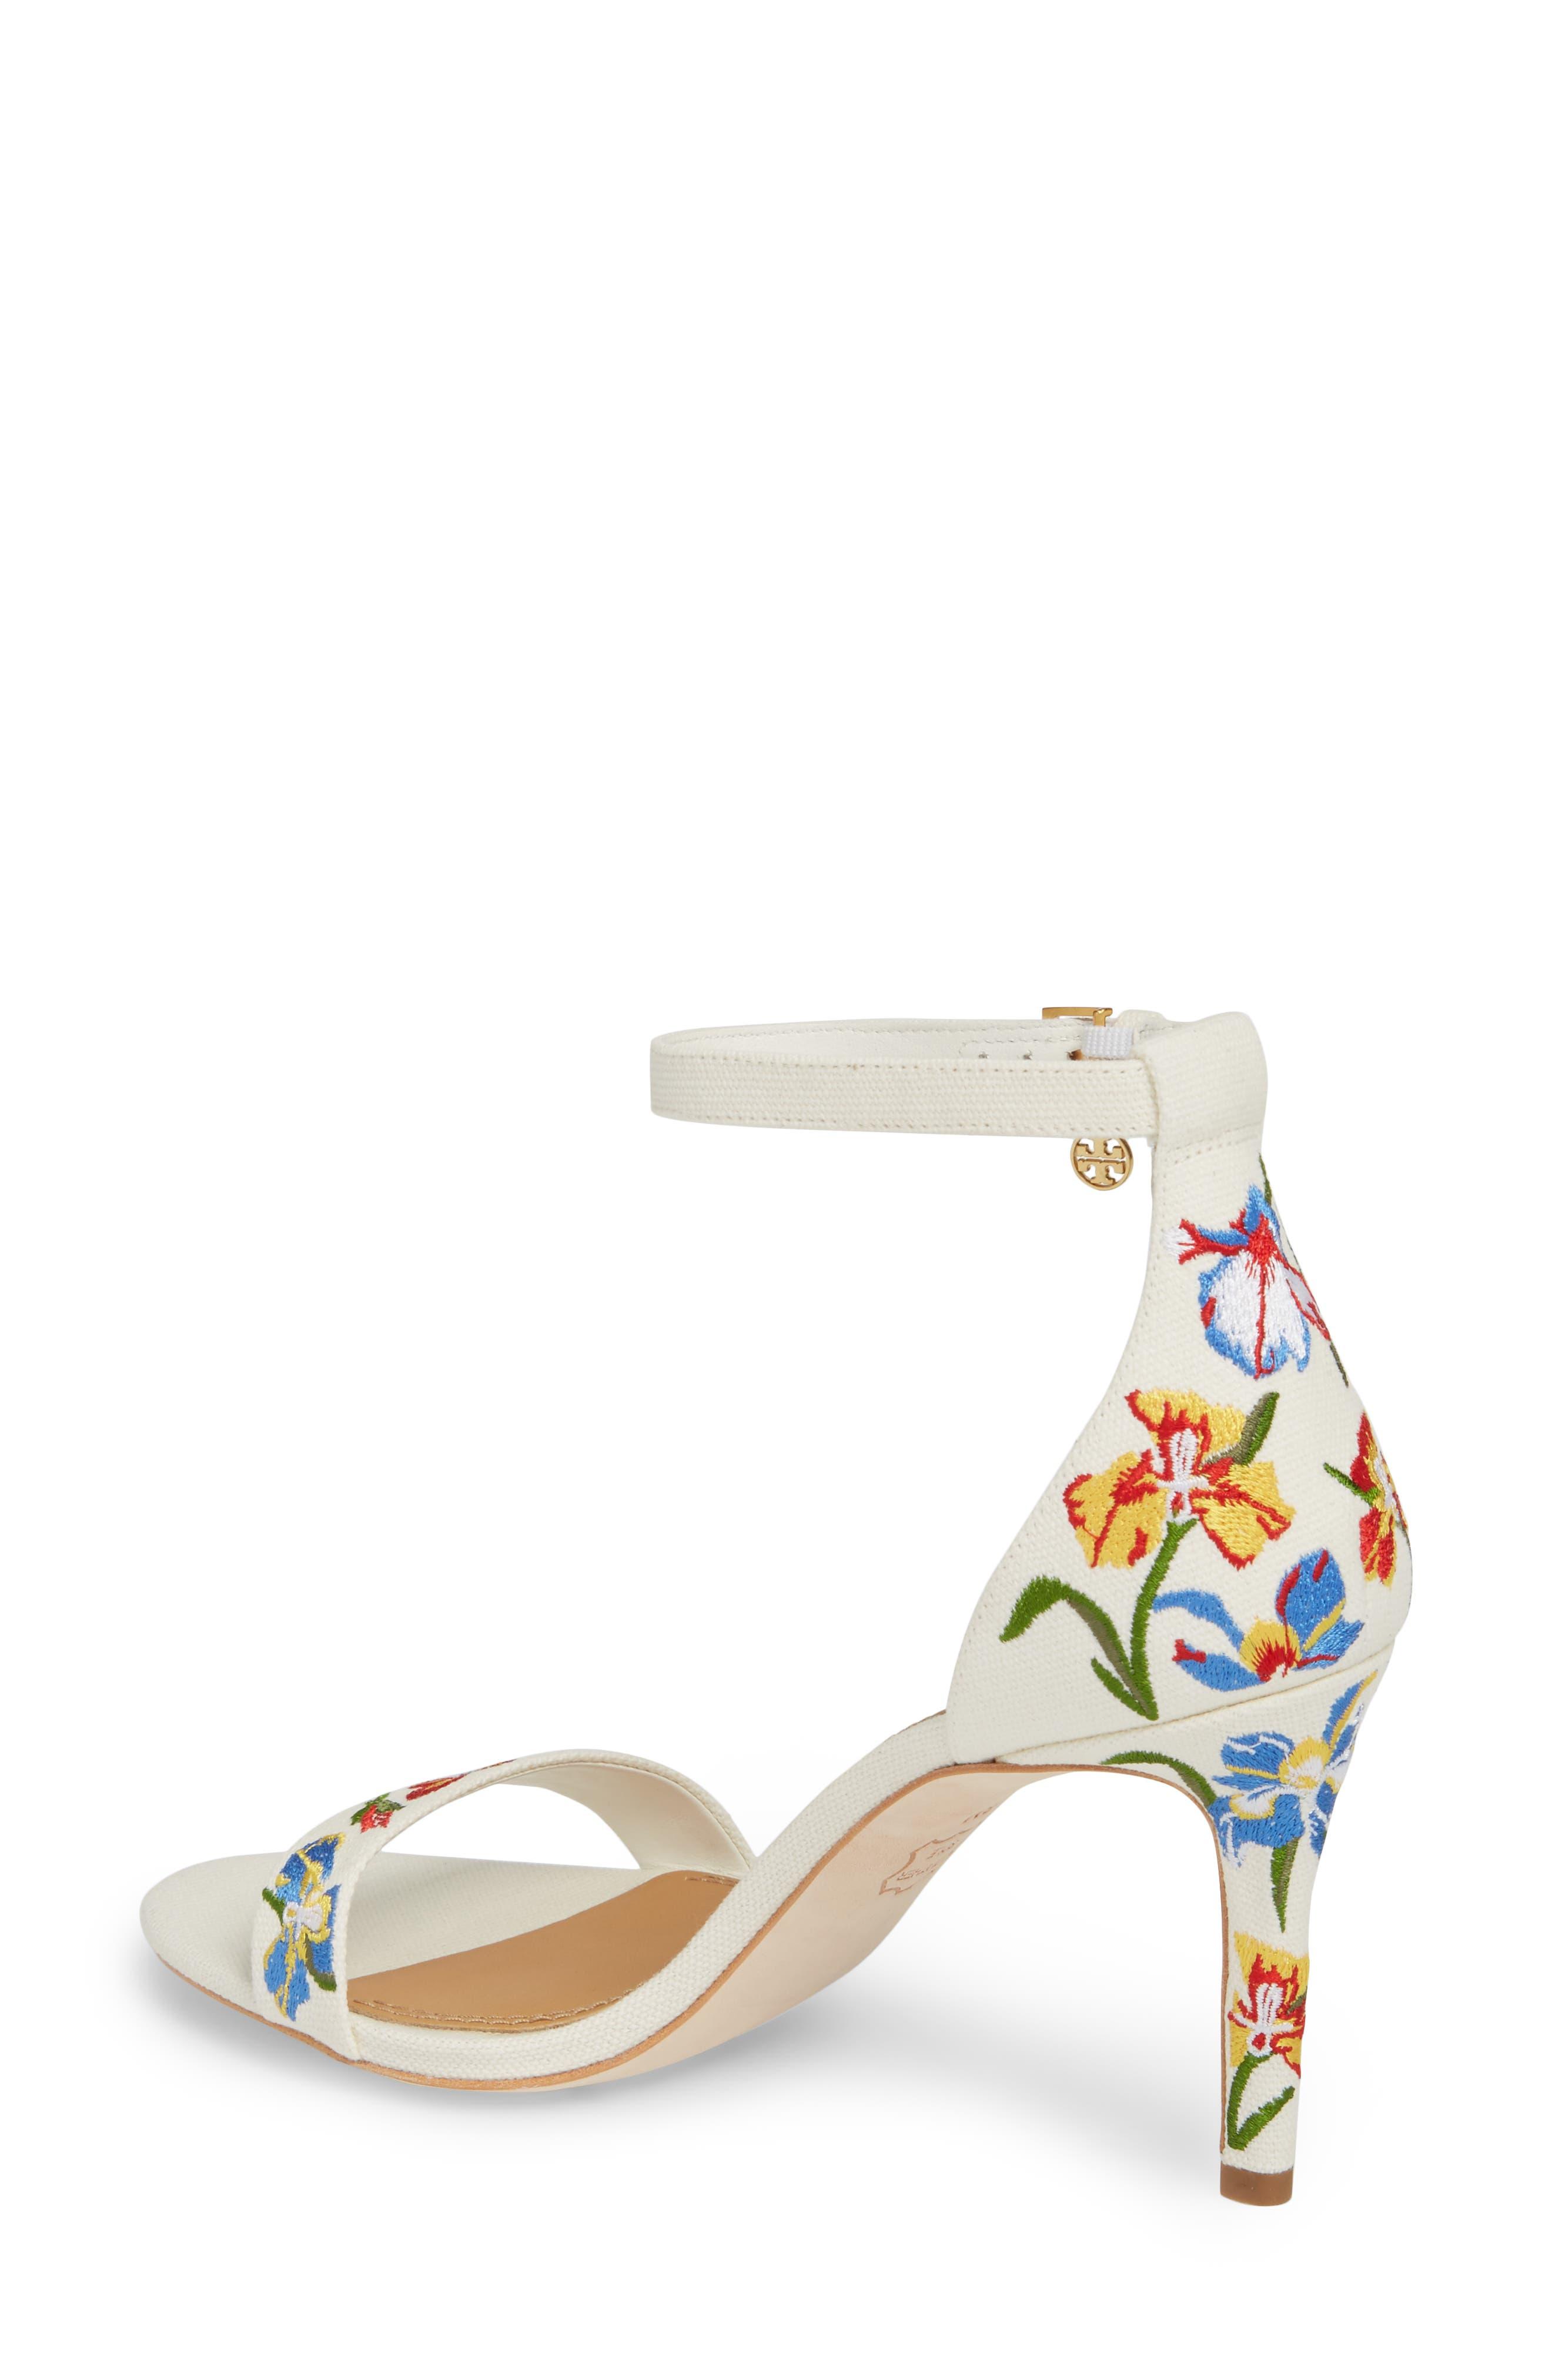 Ellie Embroidered Ankle Strap Sandal,                             Alternate thumbnail 2, color,